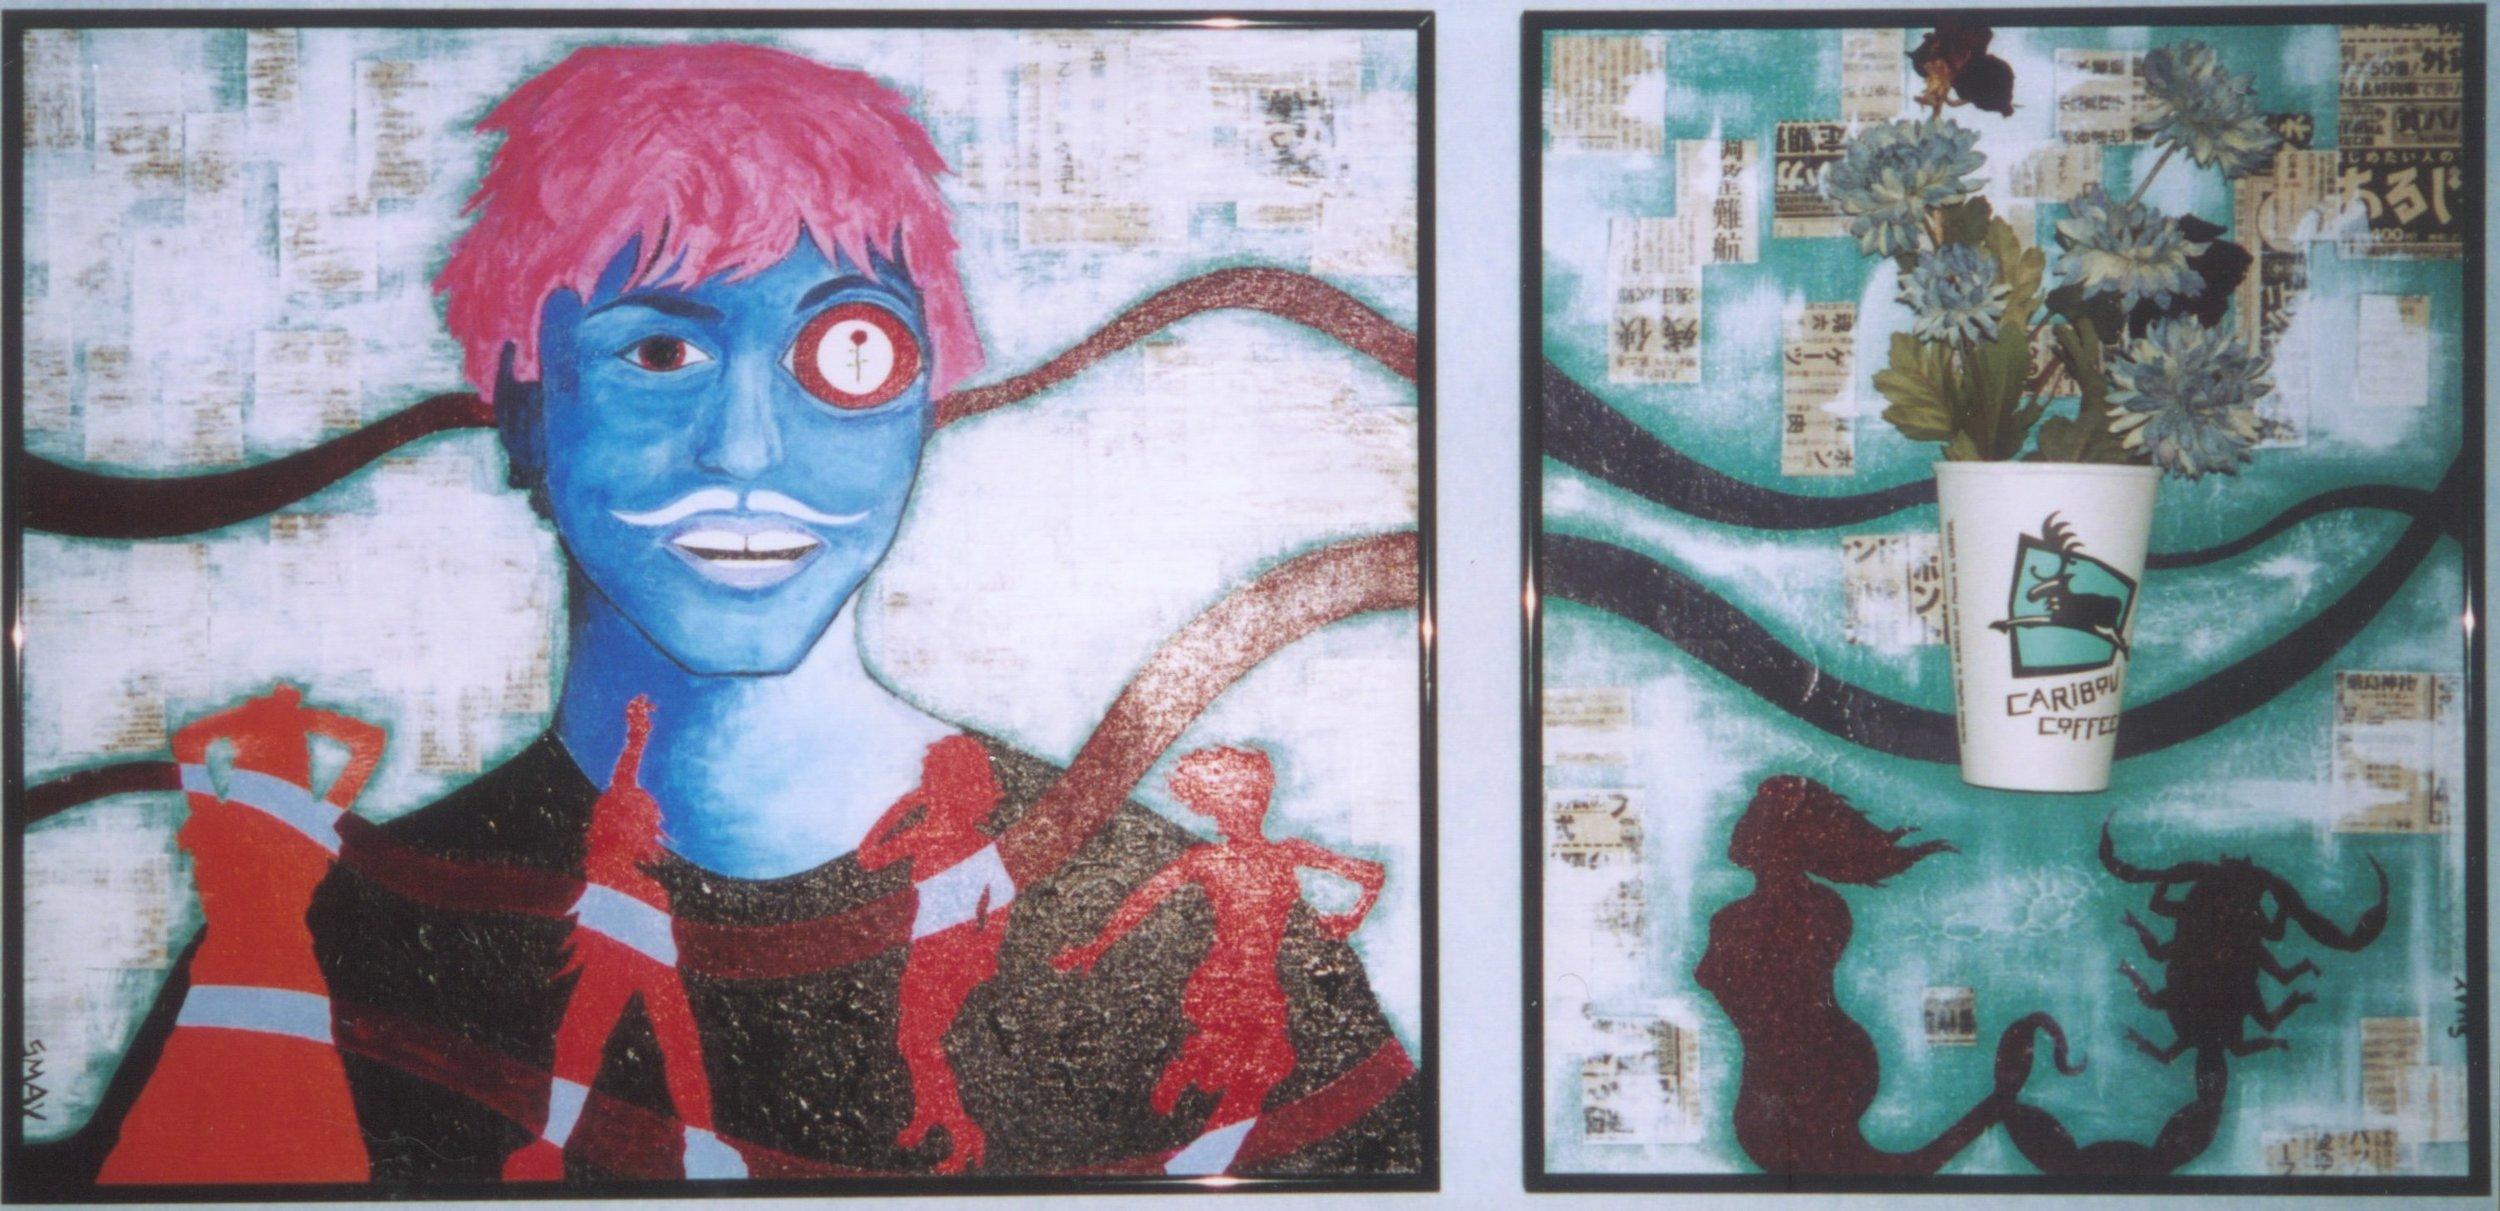 Nick  2003 Mixed media on canvas 106 x 51cm